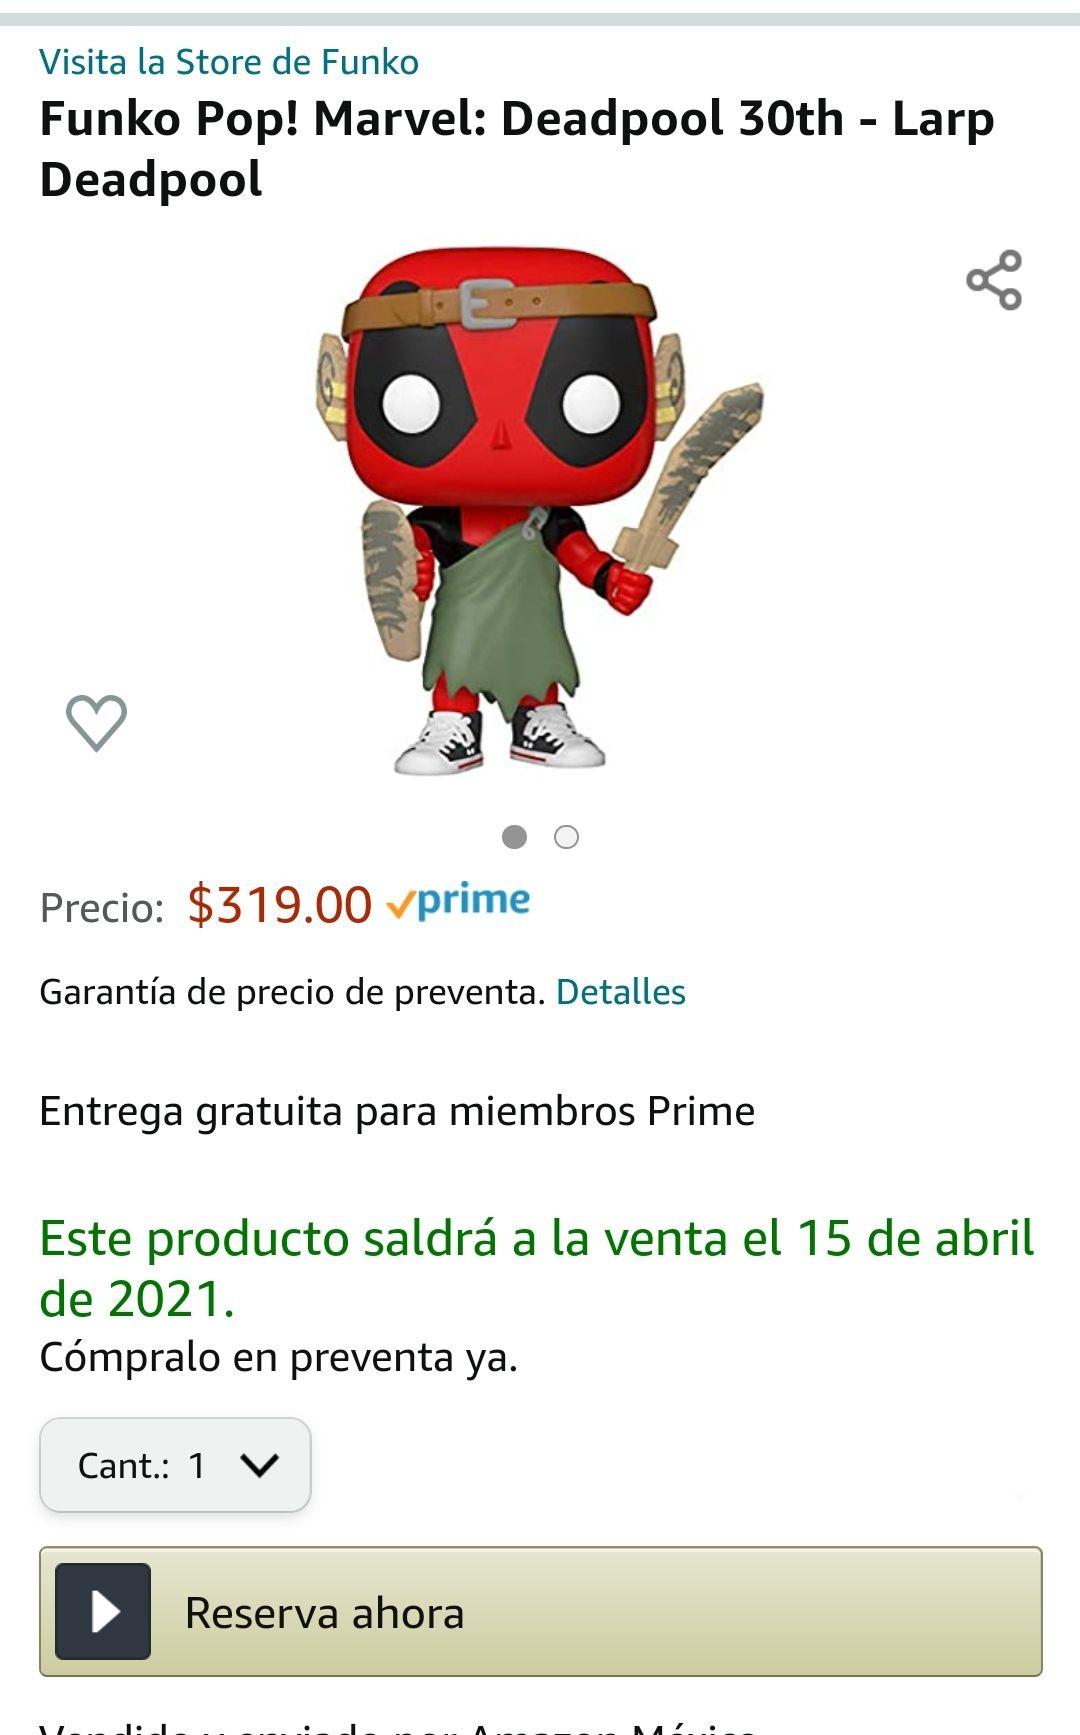 Amazon: Preventa - Funko Pop! Marvel: Deadpool 30th - Larp Deadpool